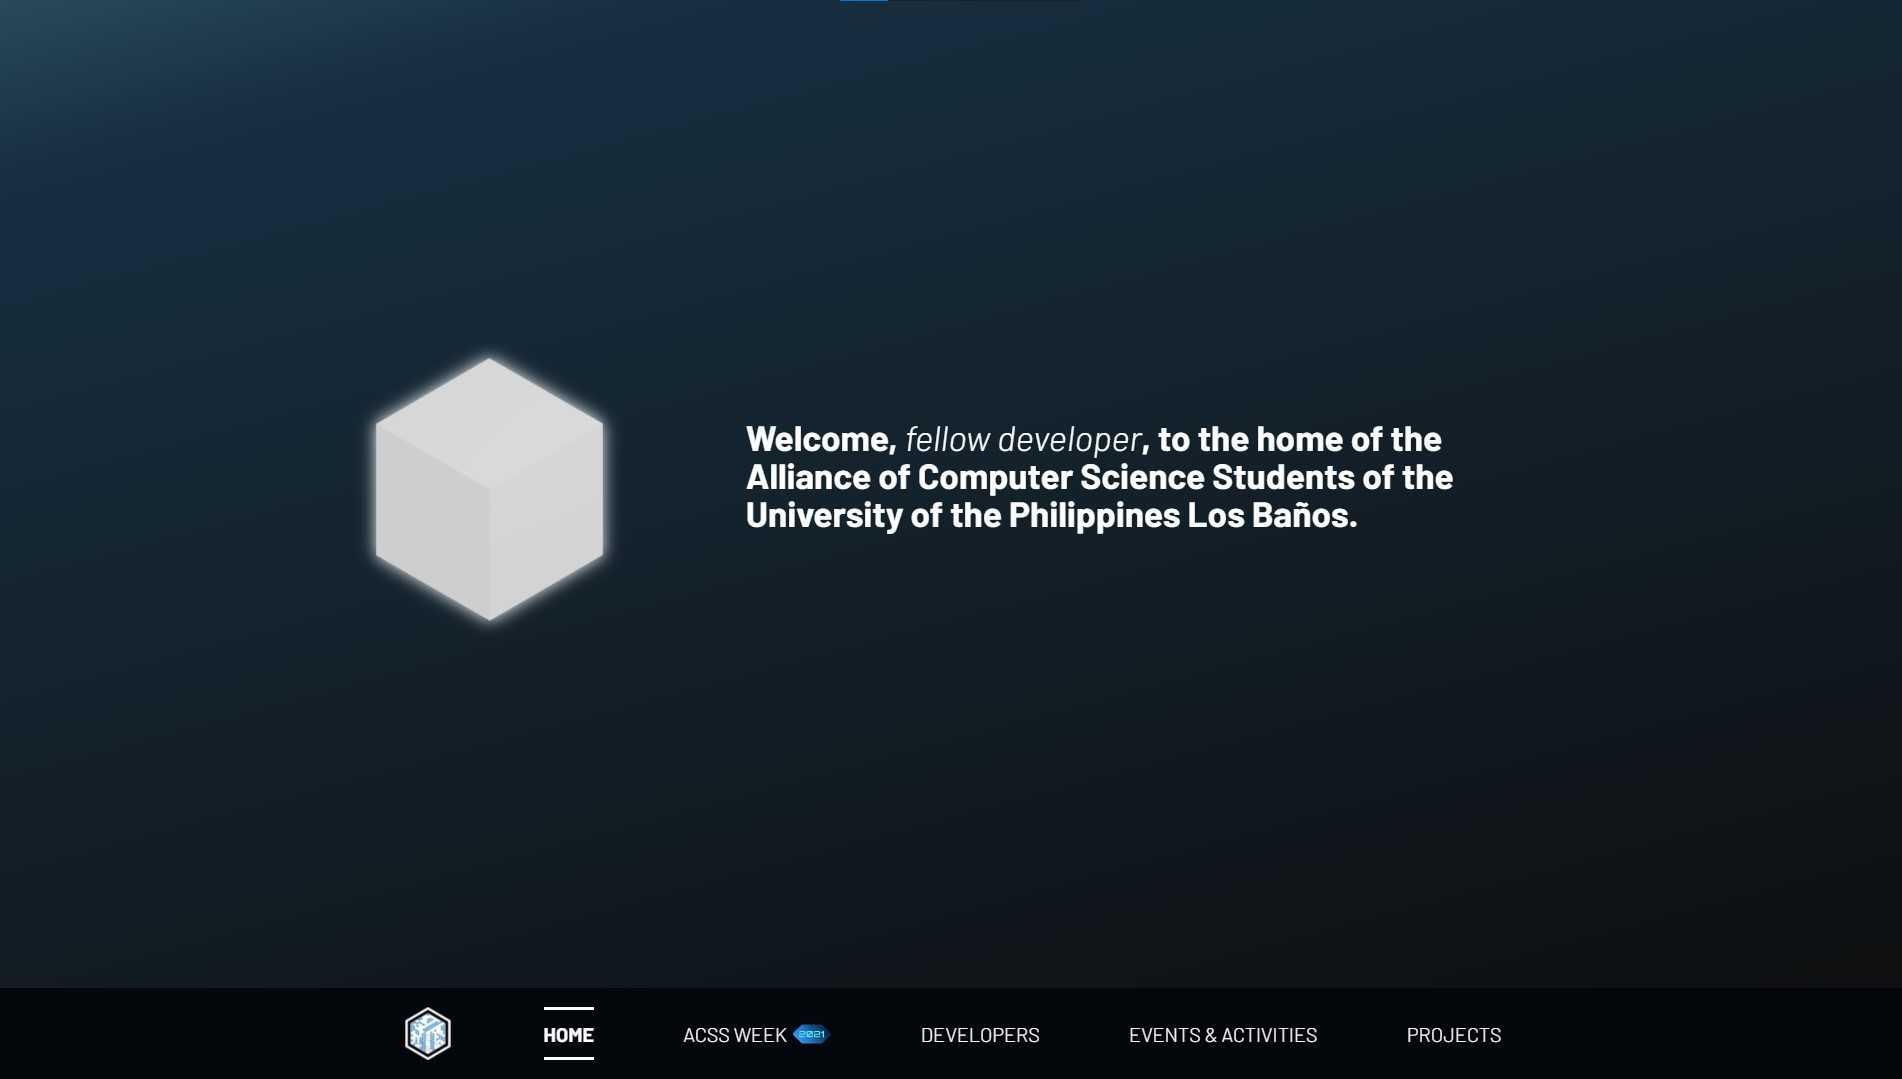 ACSS UPLB Website - Gallery Photo #2